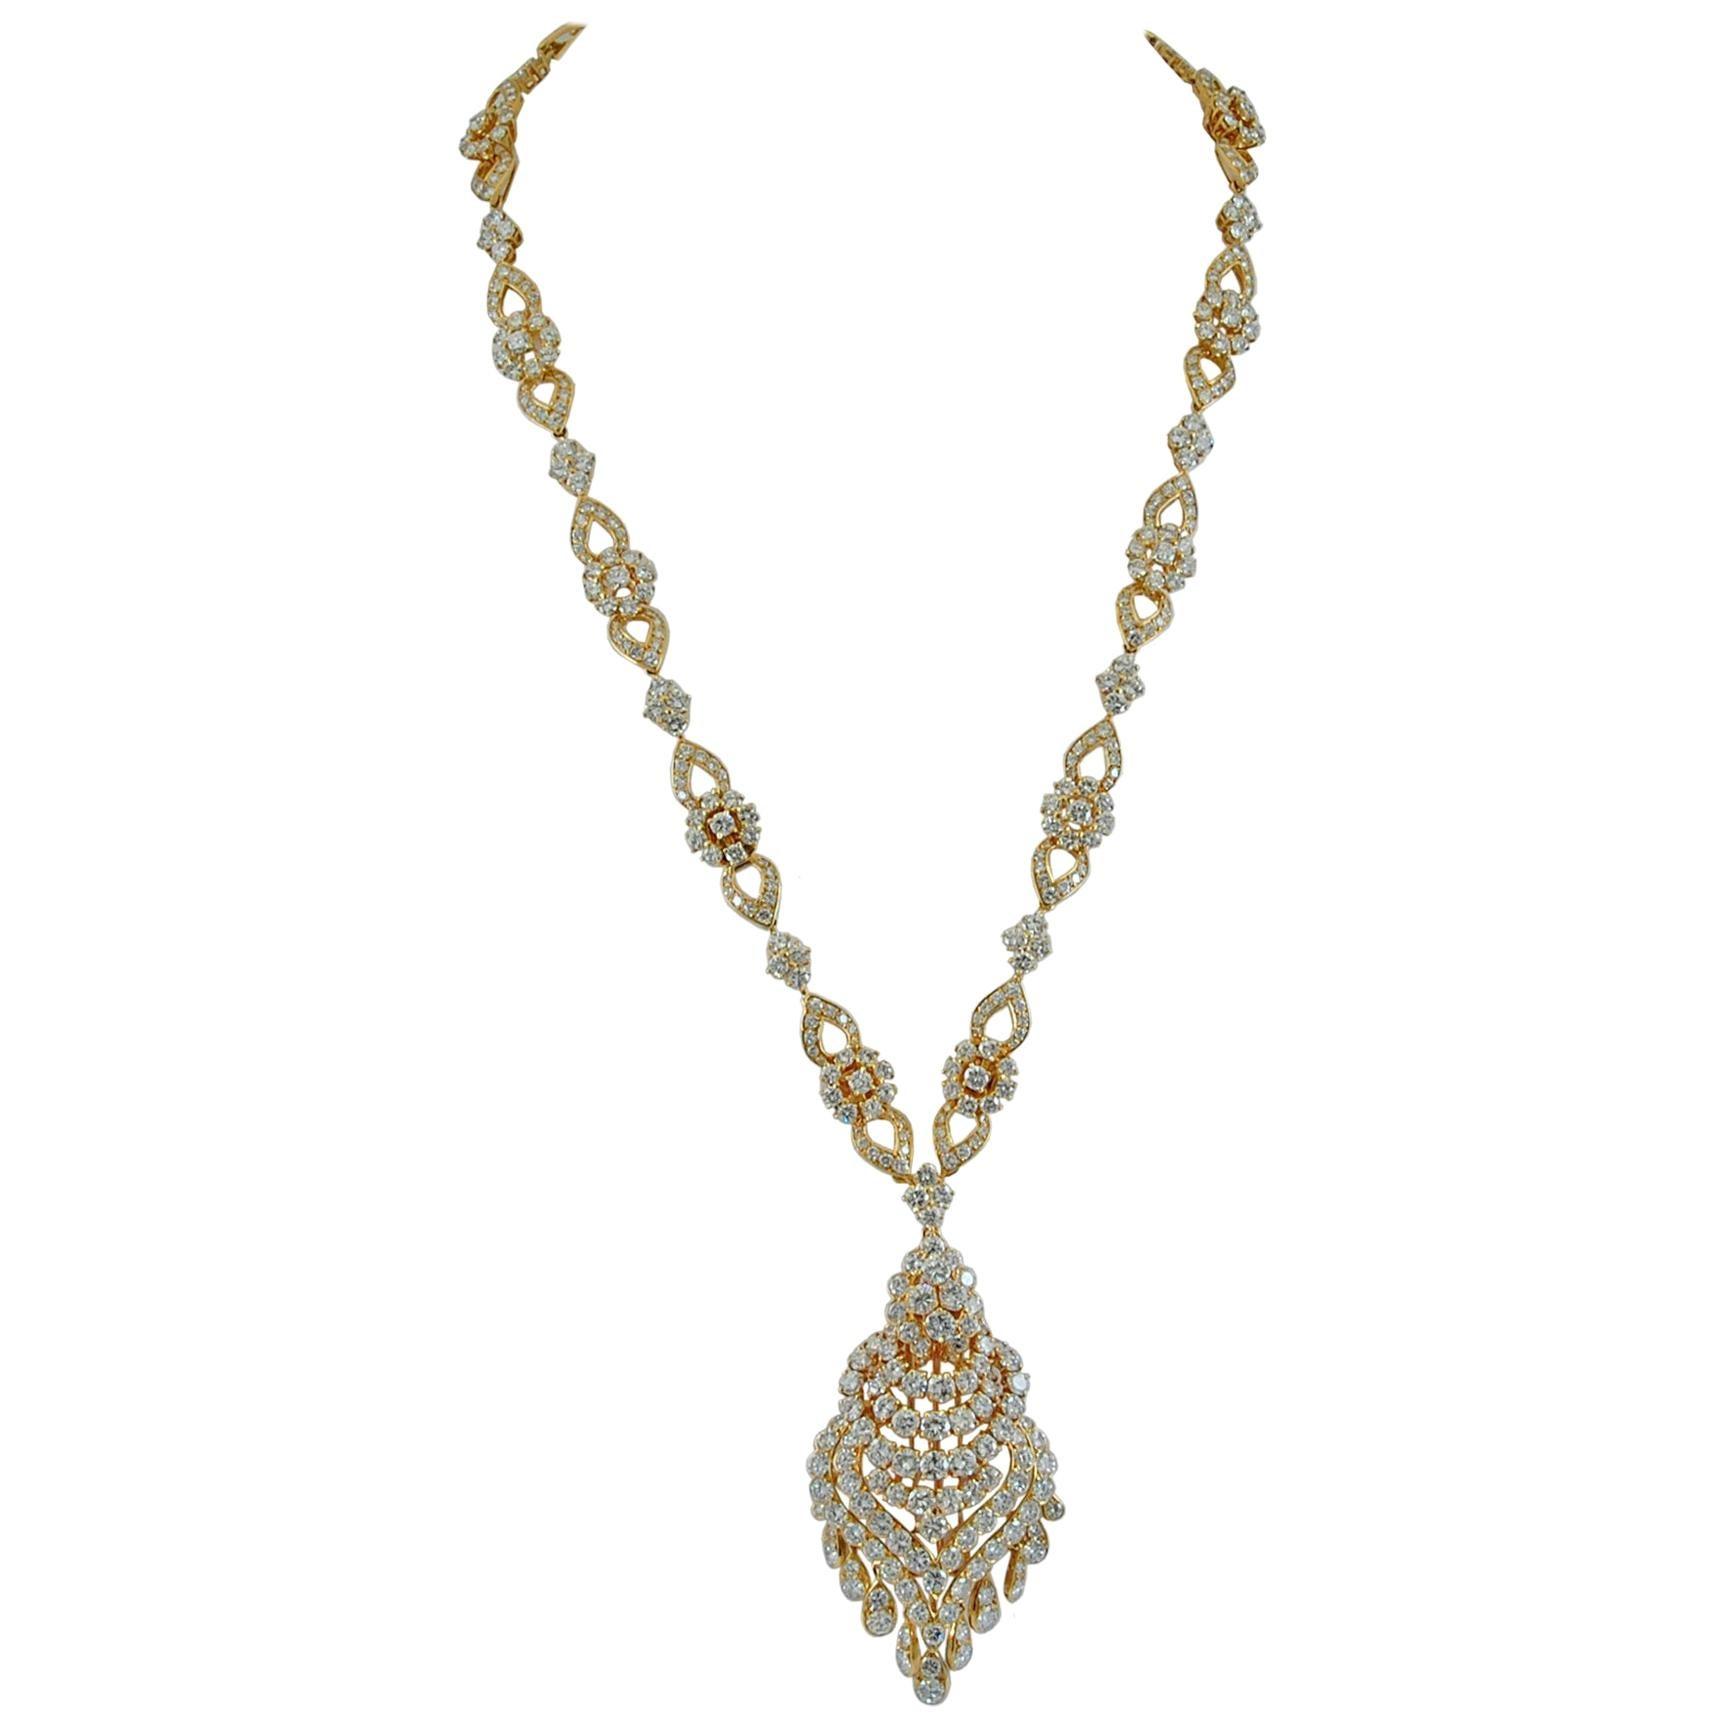 Van Cleef & Arpels Diamond Tassel Gold Necklace or Bracelet